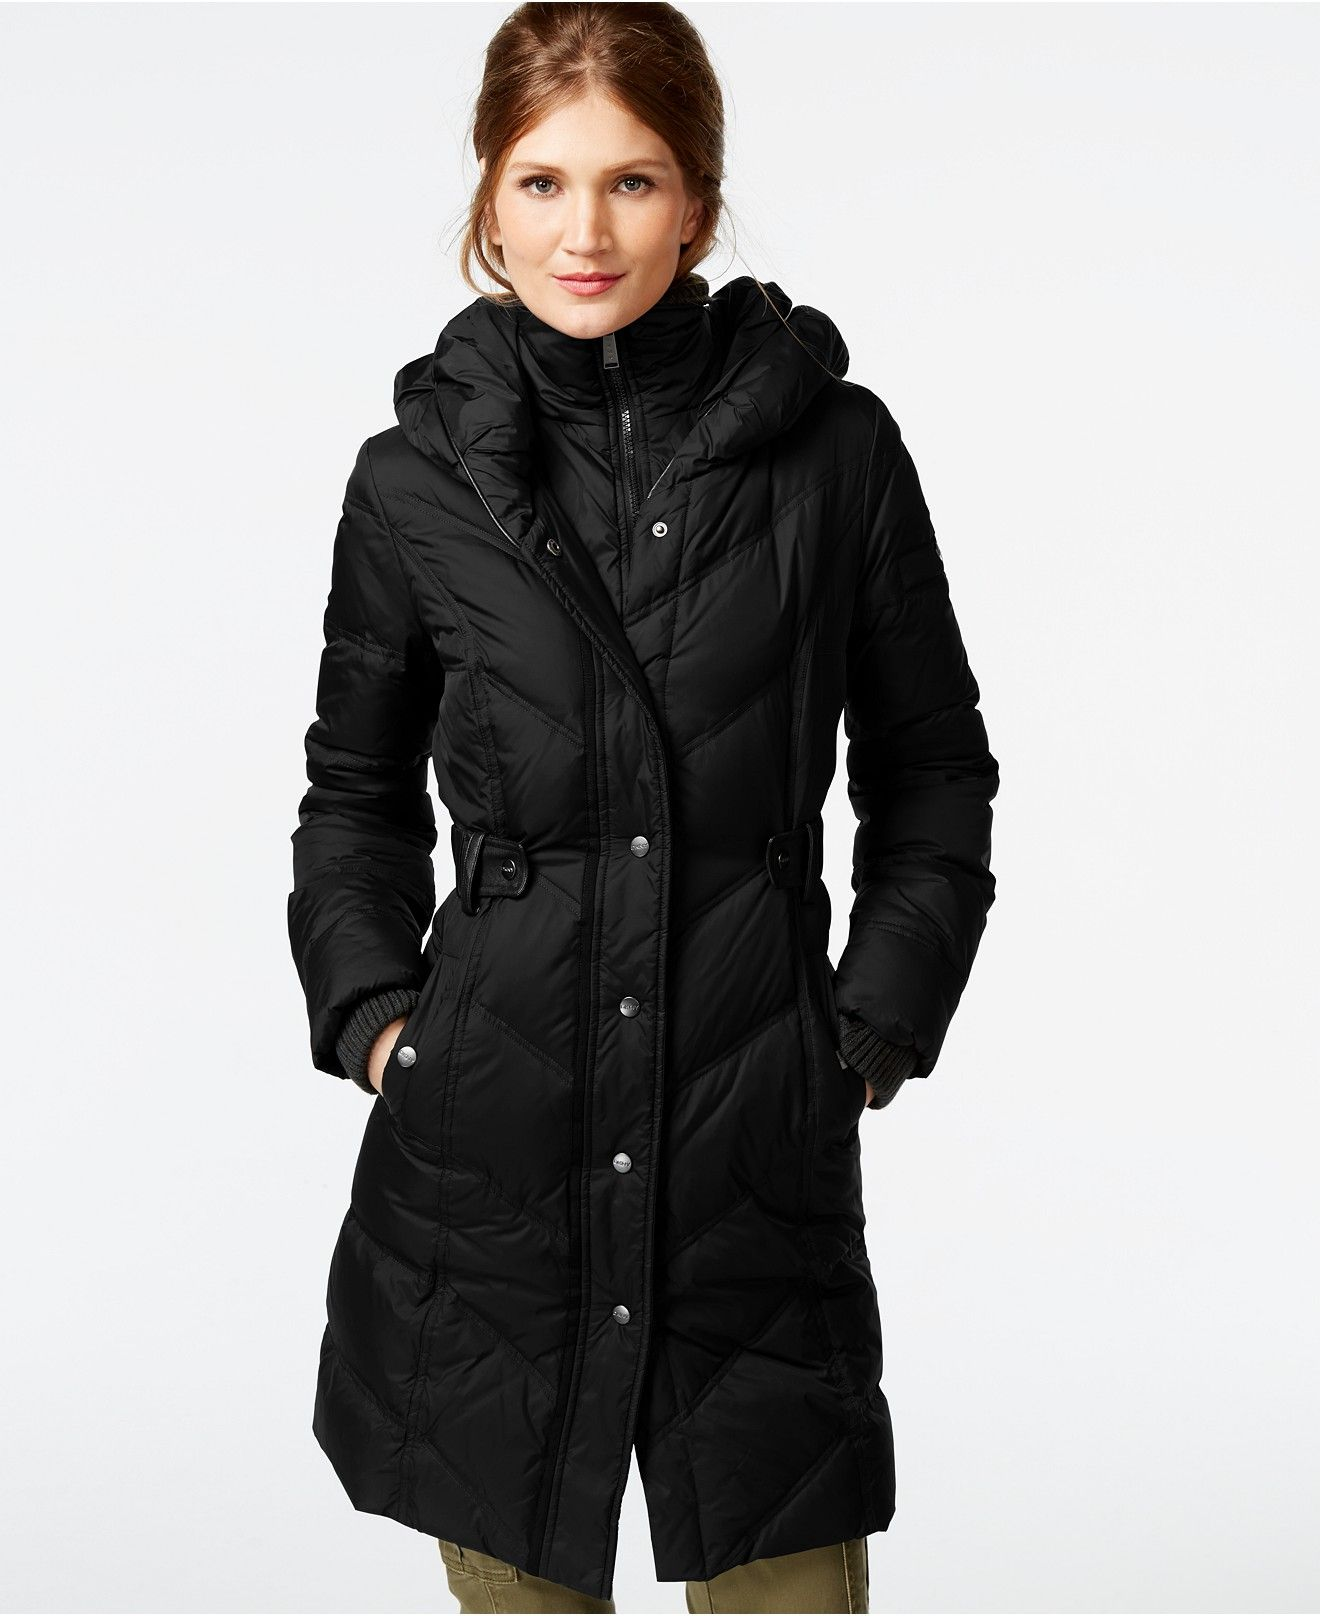 a66b1d7ac8d76 DKNY Faux-Leather-Trim Quilted Down Coat - Coats - Women - Macy s ...